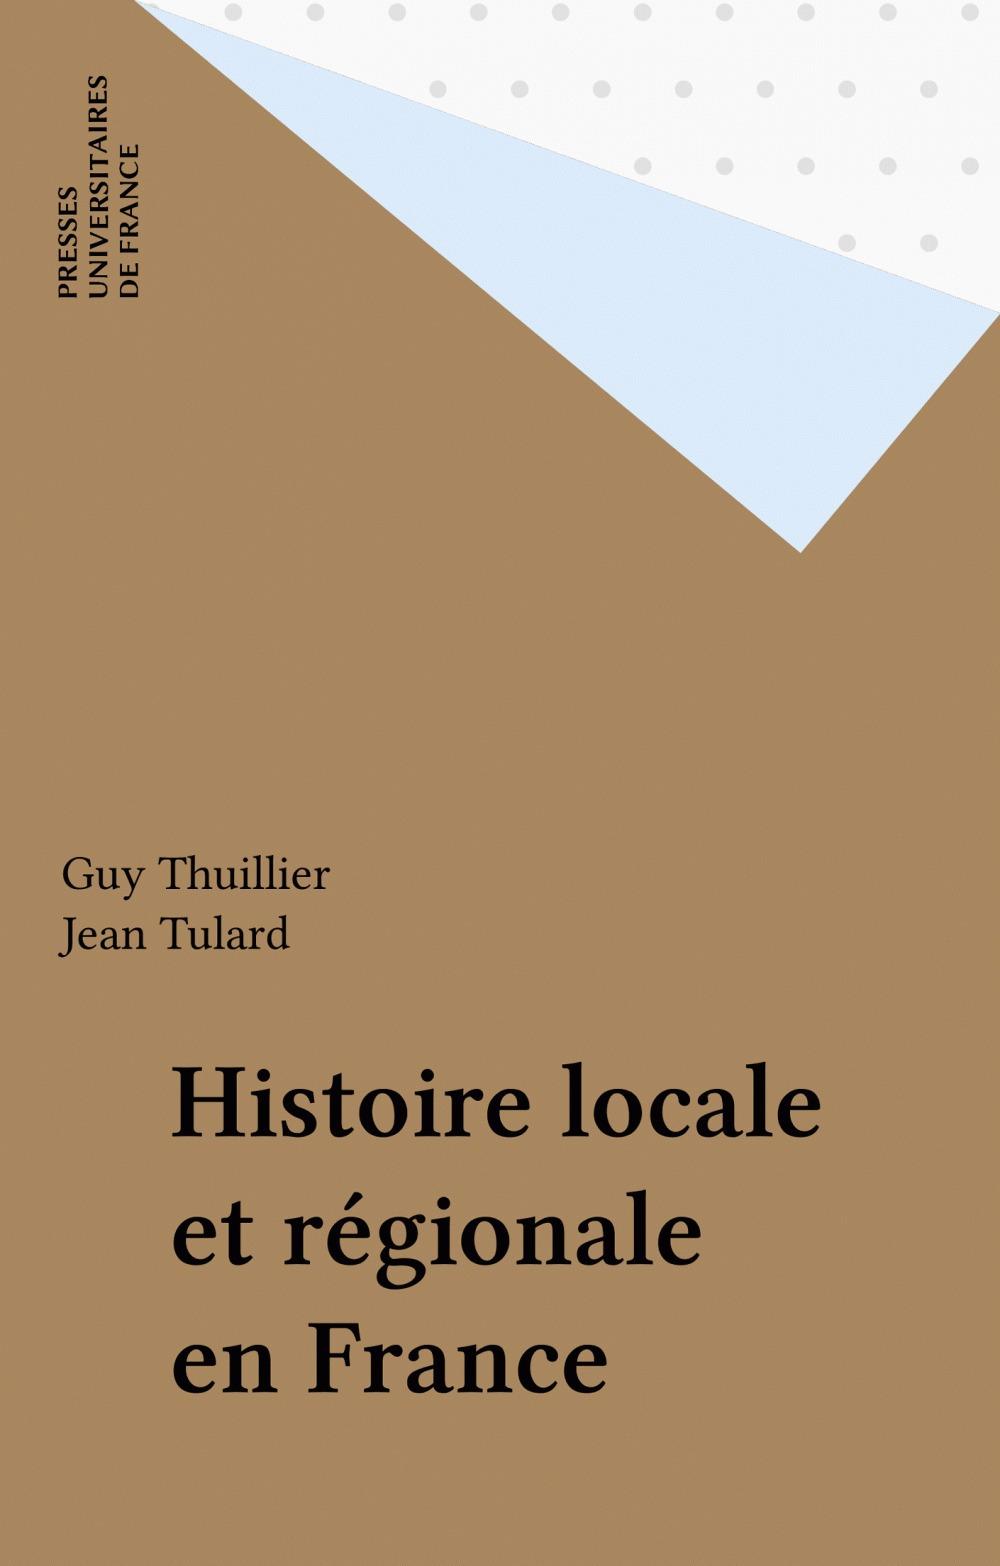 Histoire locale et régionale en France  - Thuillier/Tulard G/J  - Jean Tulard  - Guy Thuillier